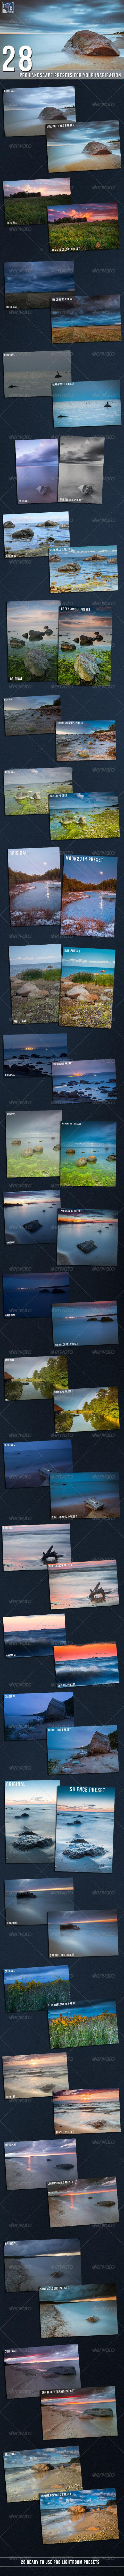 GraphicRiver 28 Pro Landscape Presets 7692614